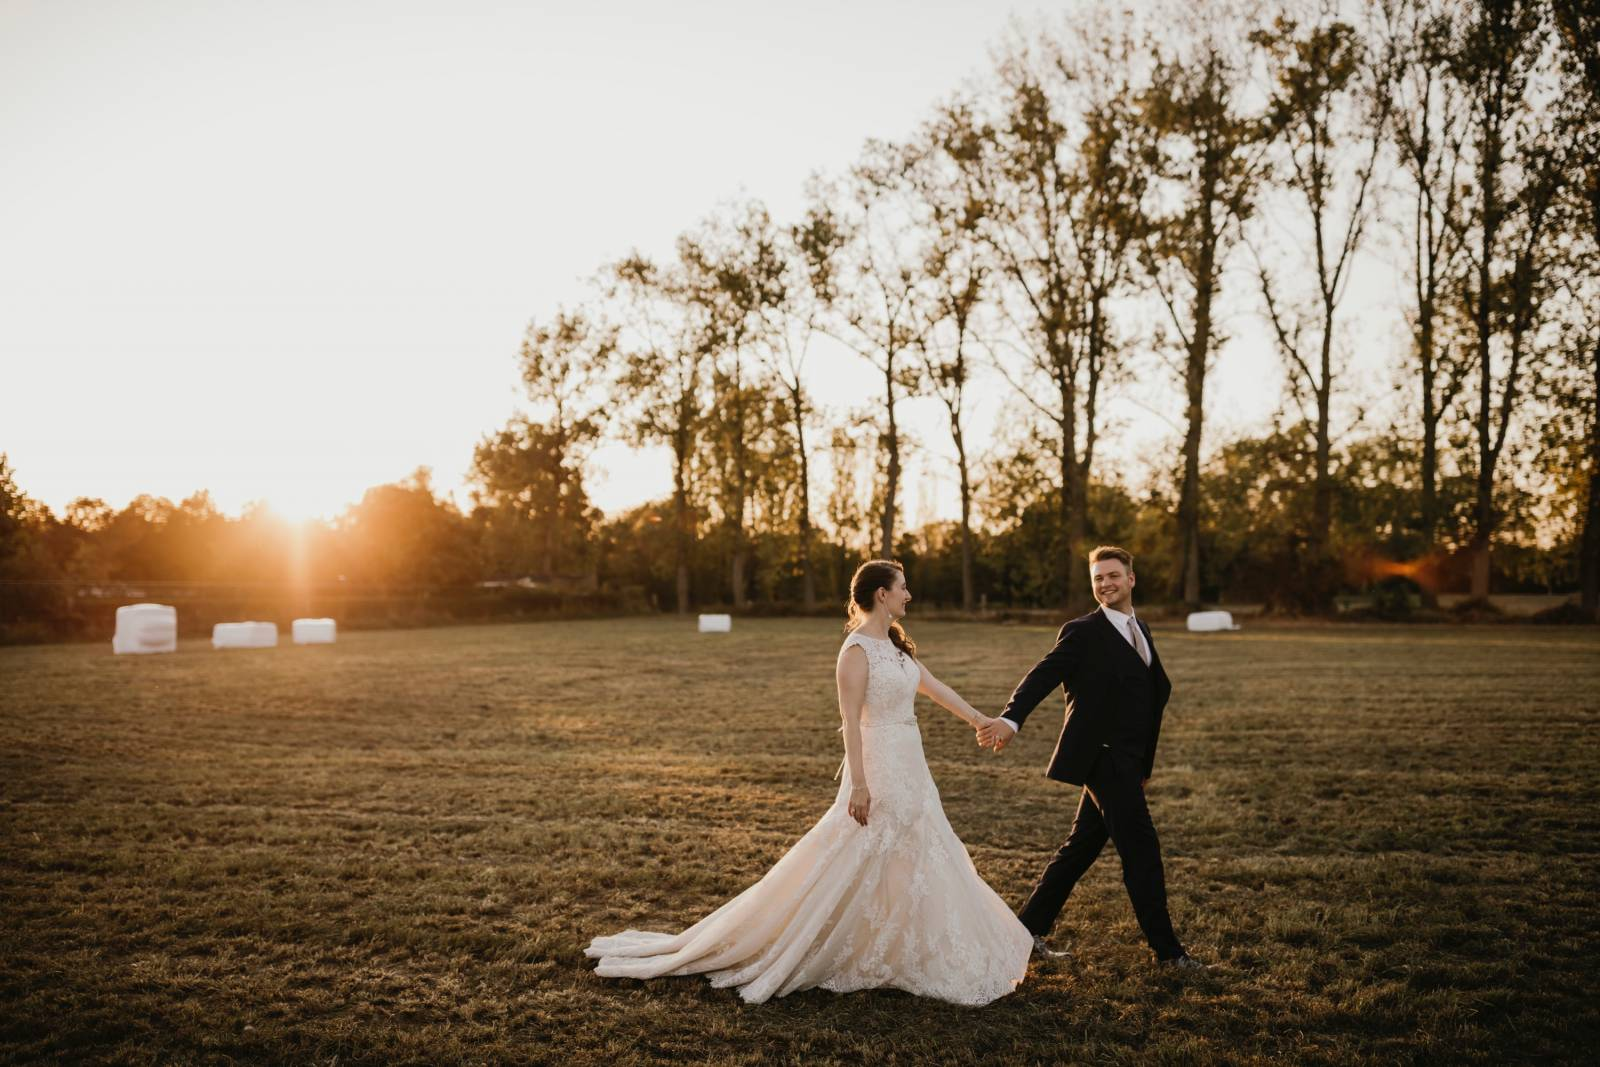 Imperish Weddings & Photography - Trouwfotograaf - Huwelijksfotograaf - Bruidsfotograaf - House of Weddings - 28